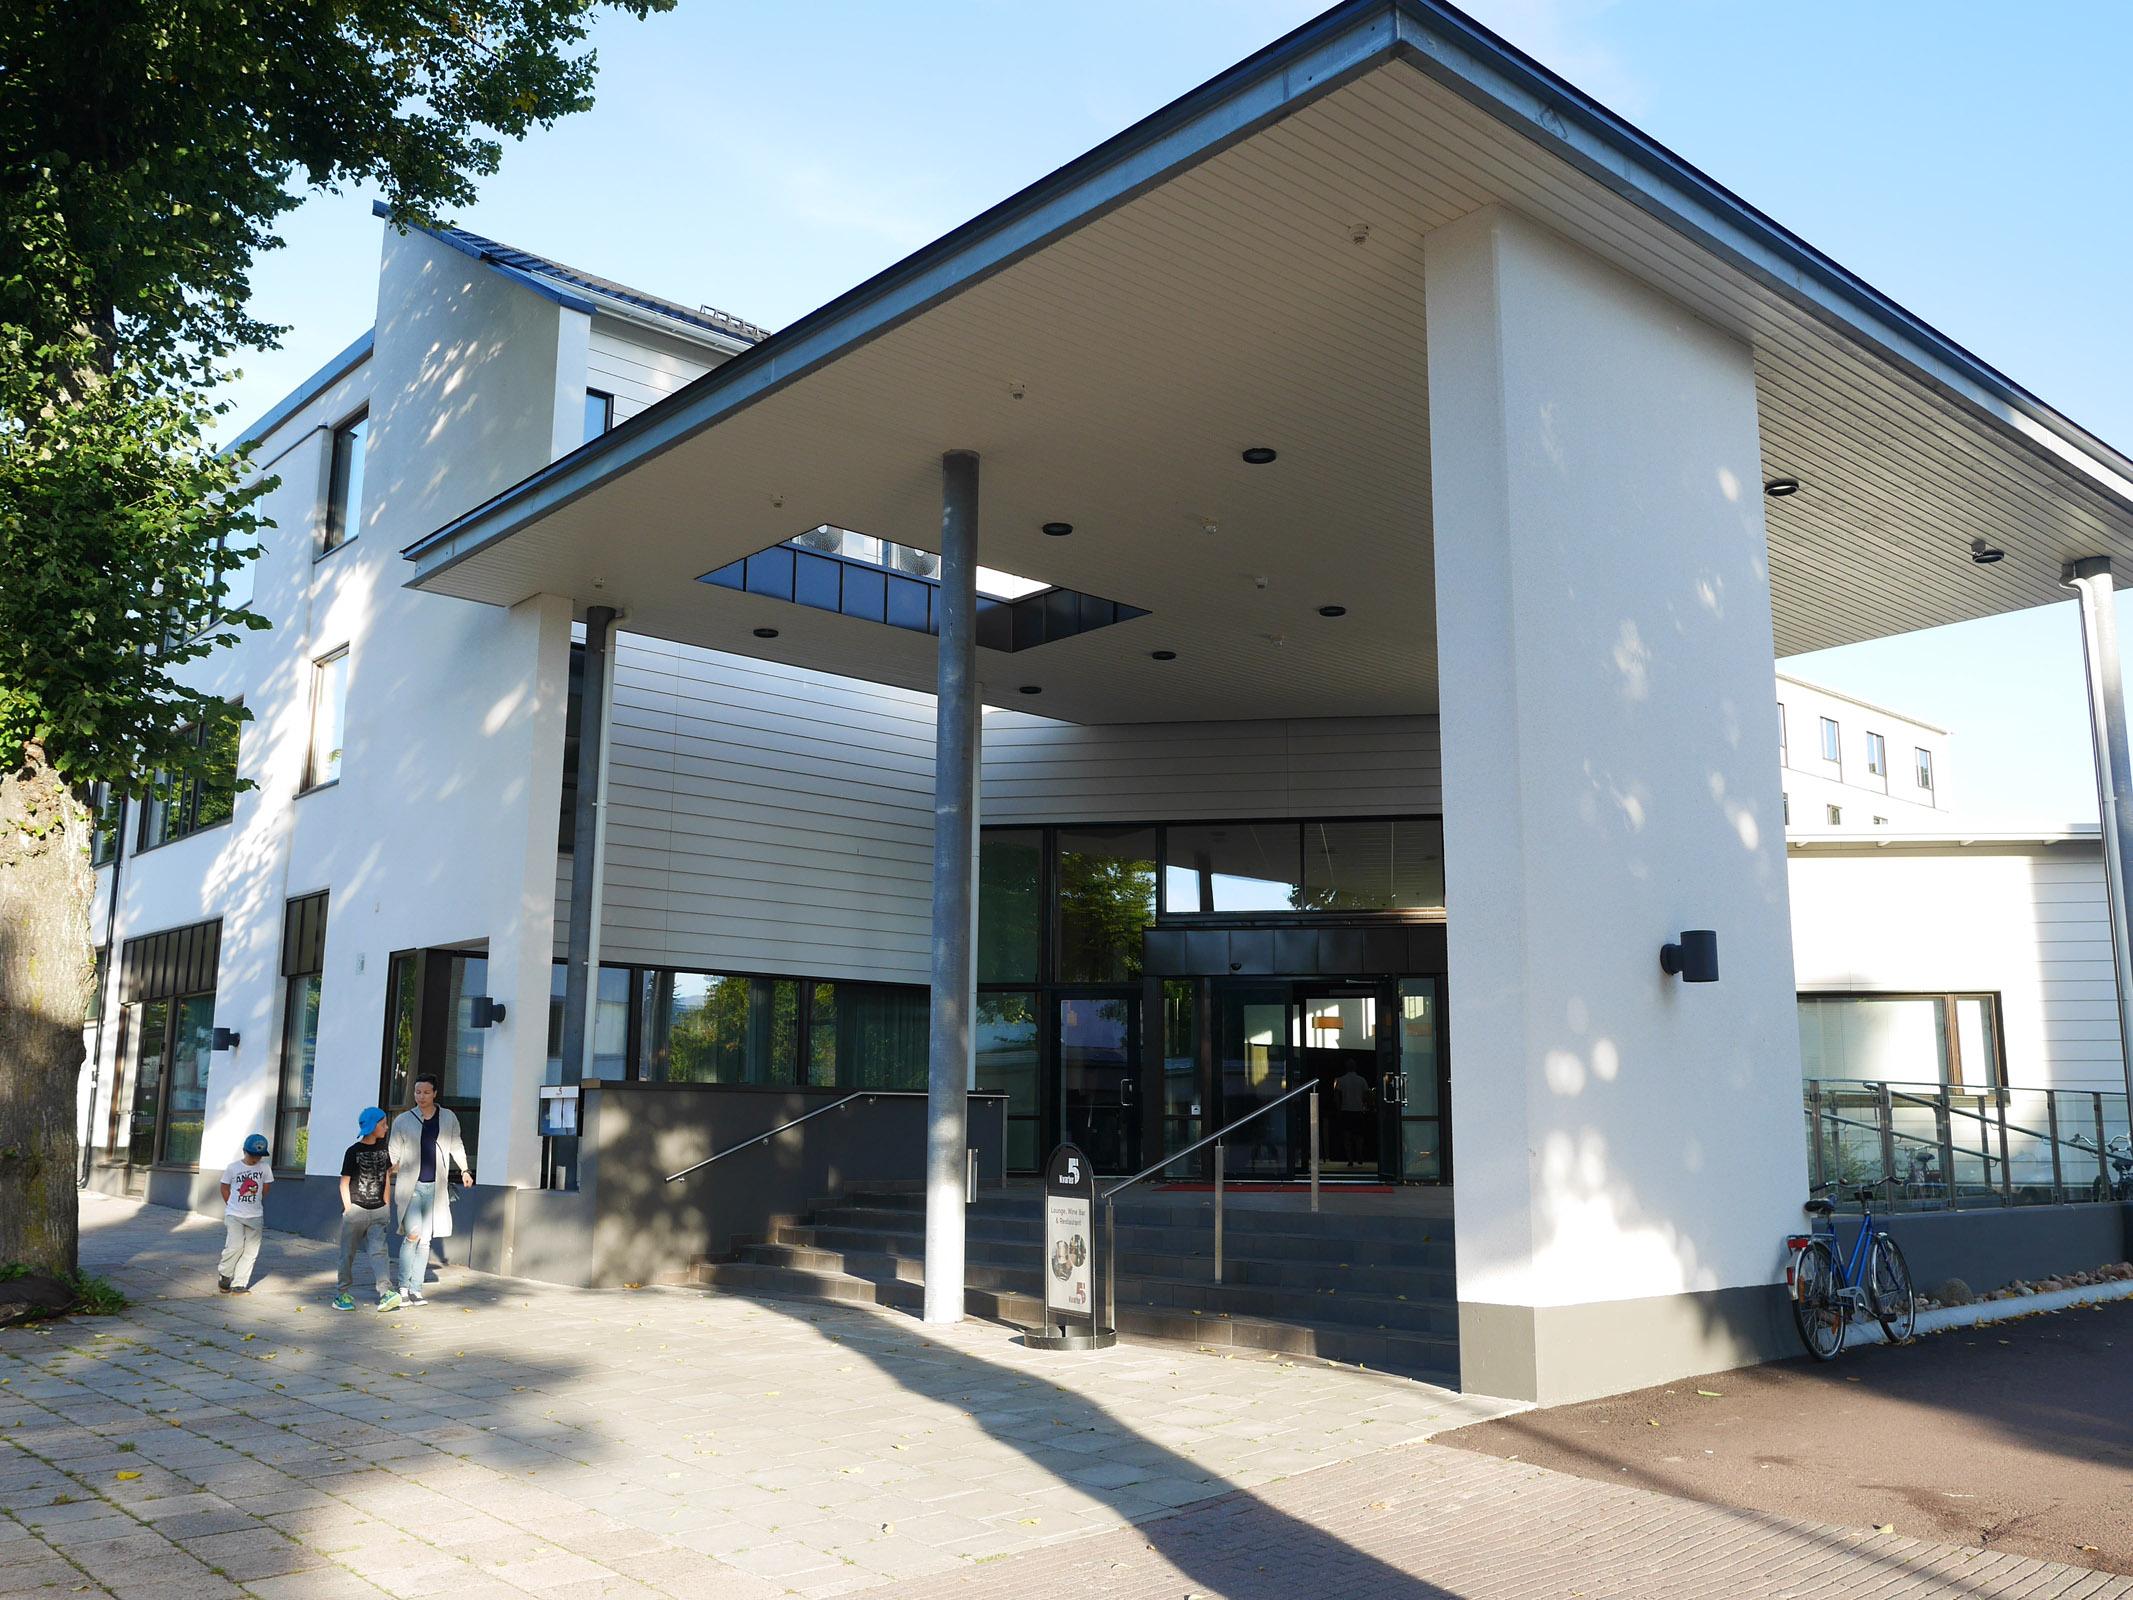 Hotell Pommern Mariehamn